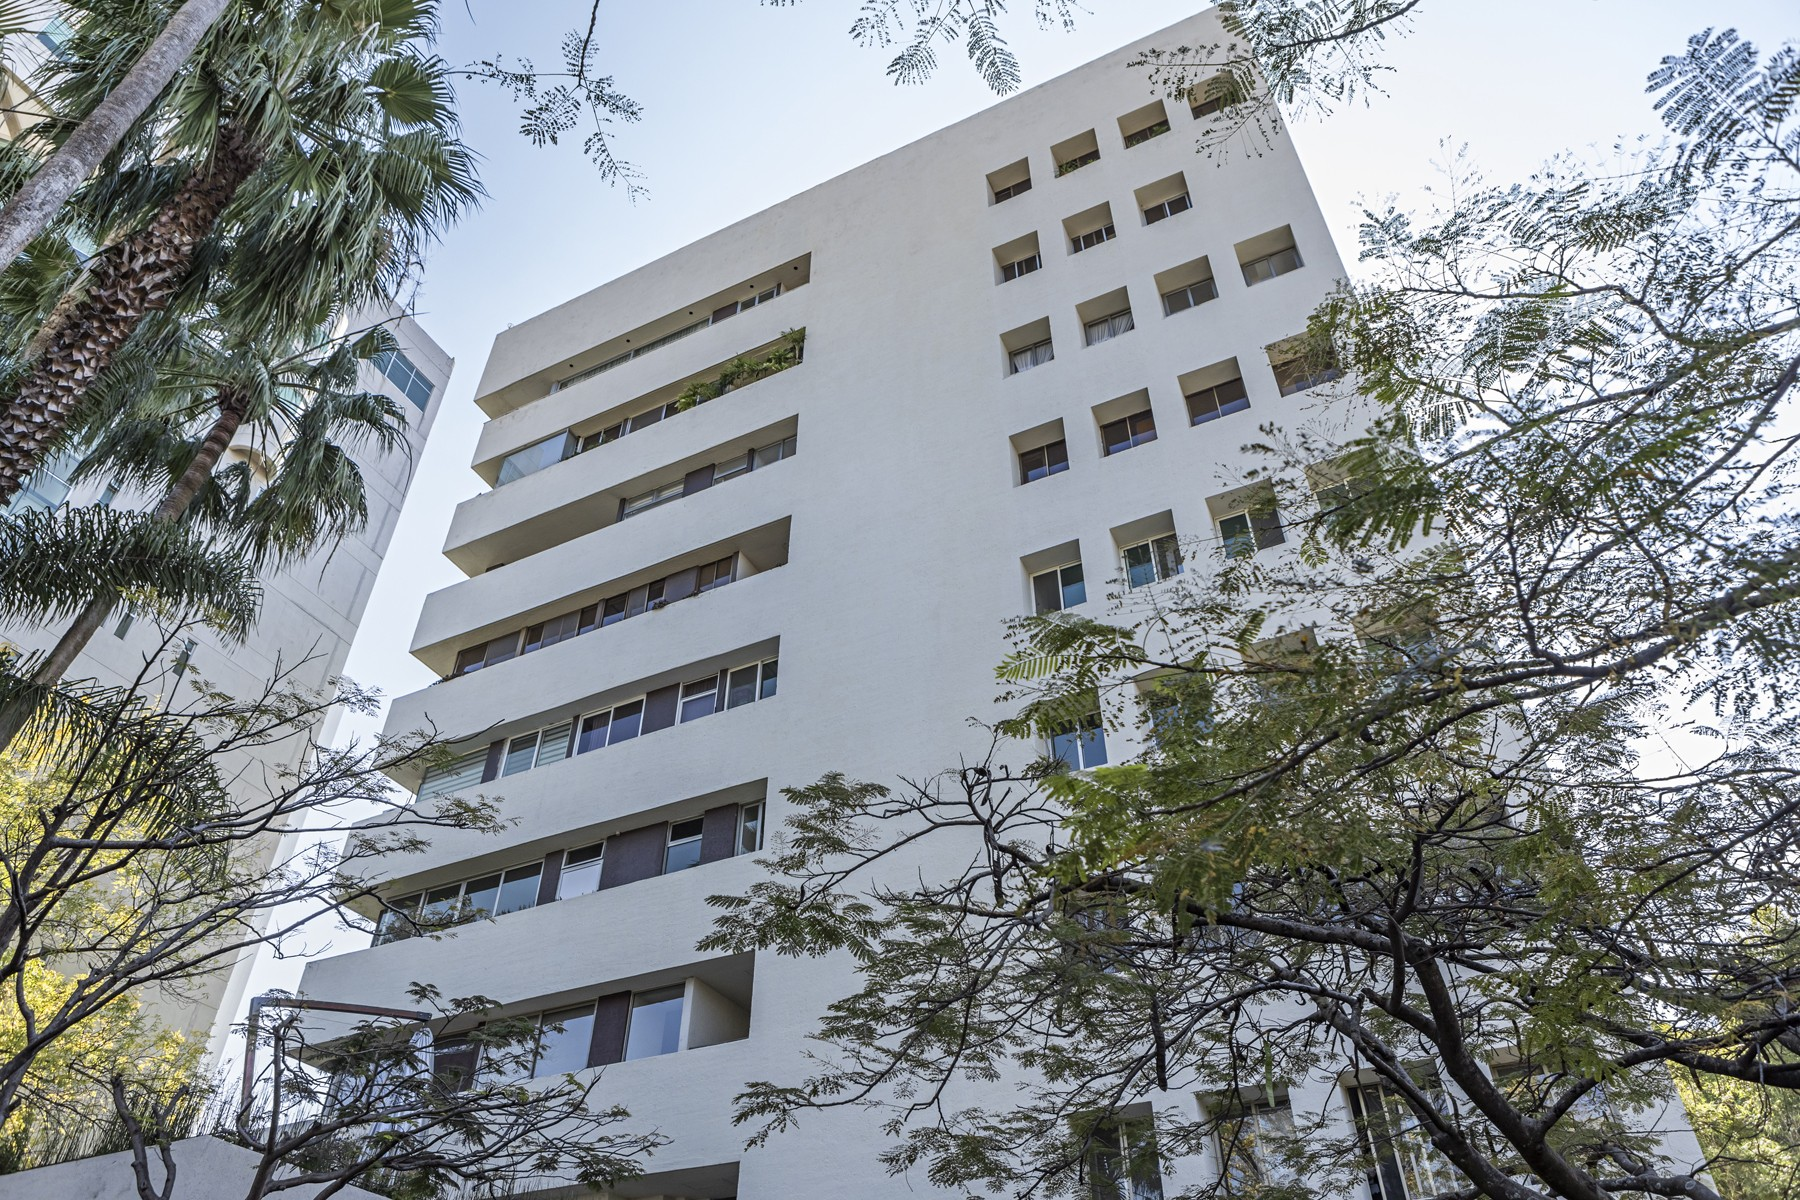 Apartment for Sale at Piso 3, Río de la Plata Rio de la Plata 2509 Guadalajara, 44660 Mexico